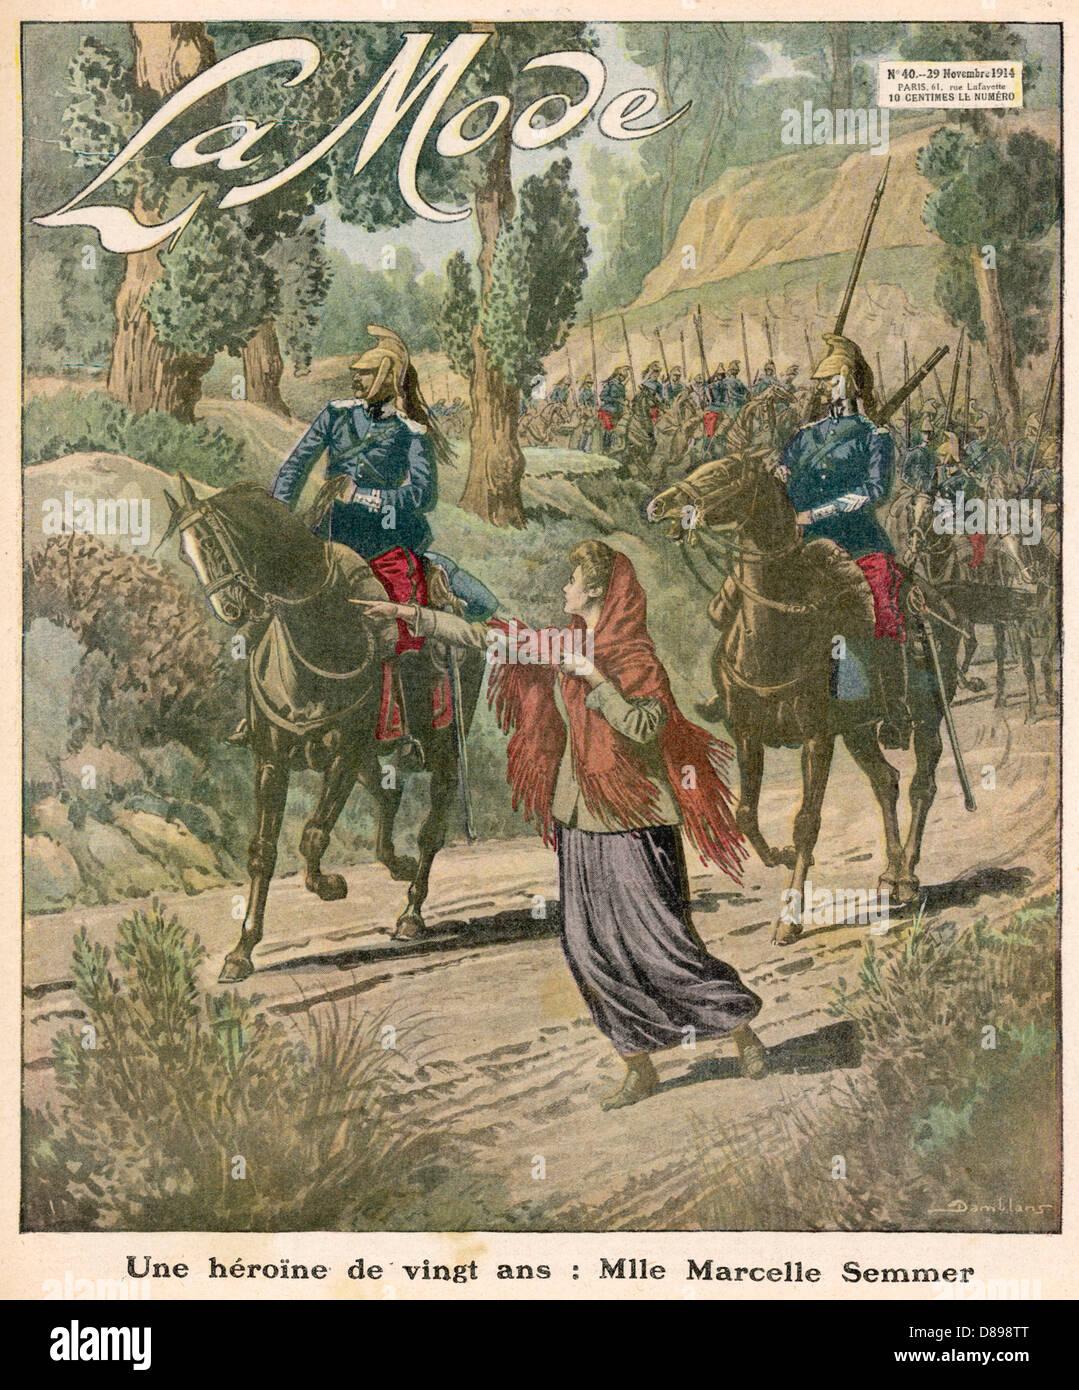 Heroic French Girl - Stock Image